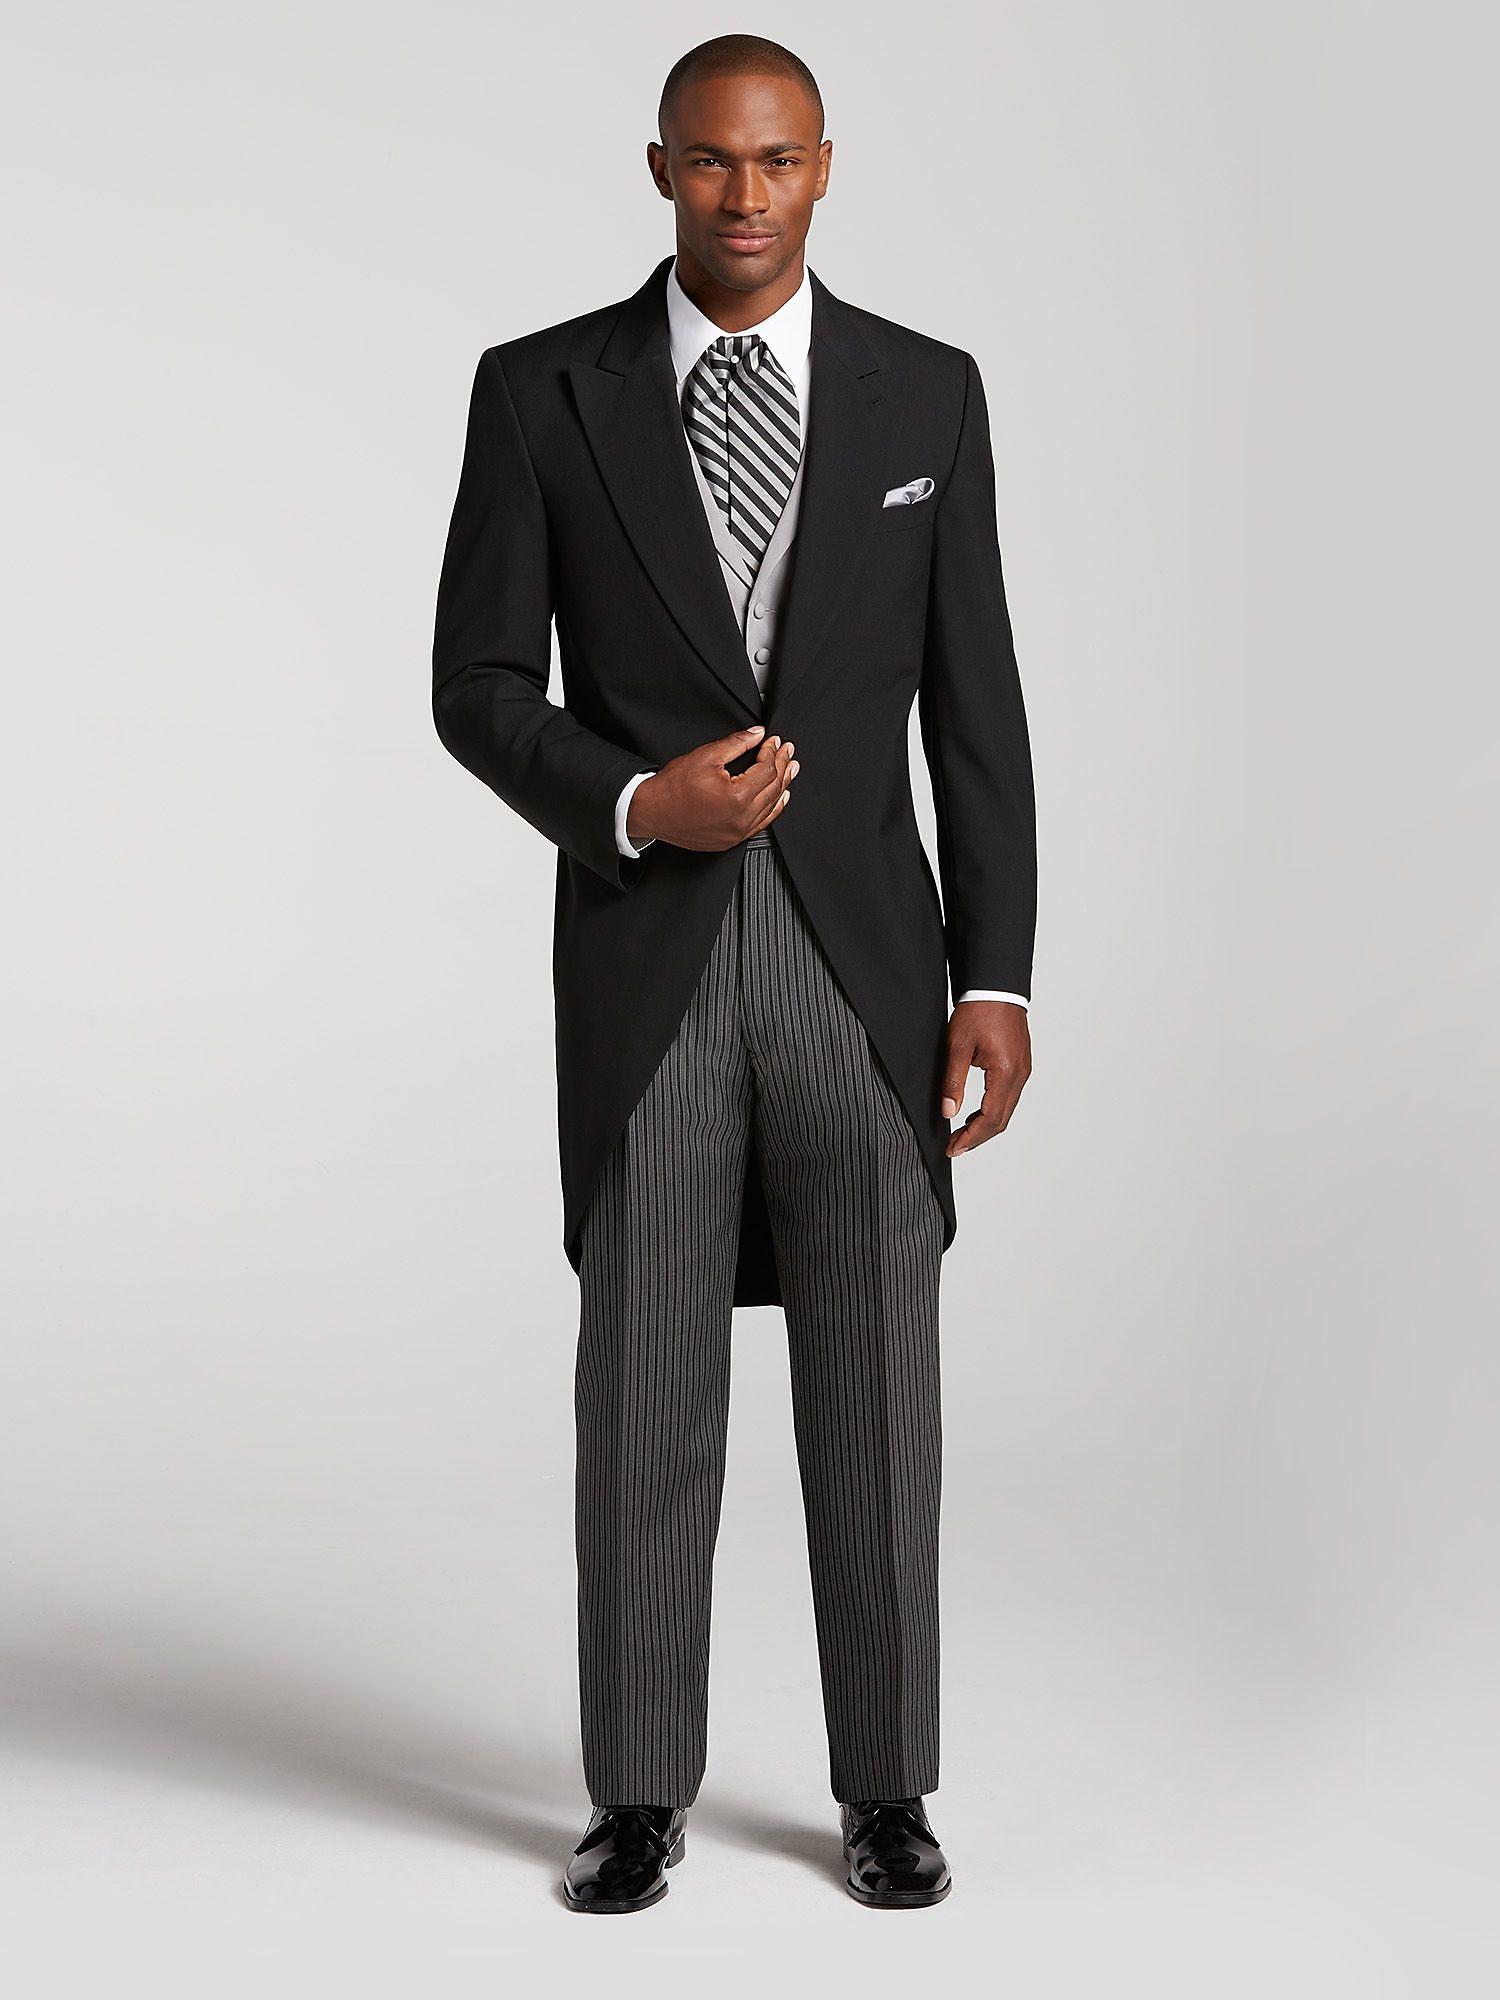 Black cutaway tuxedo by joseph feiss tuxedo rental men for Tuxedo house